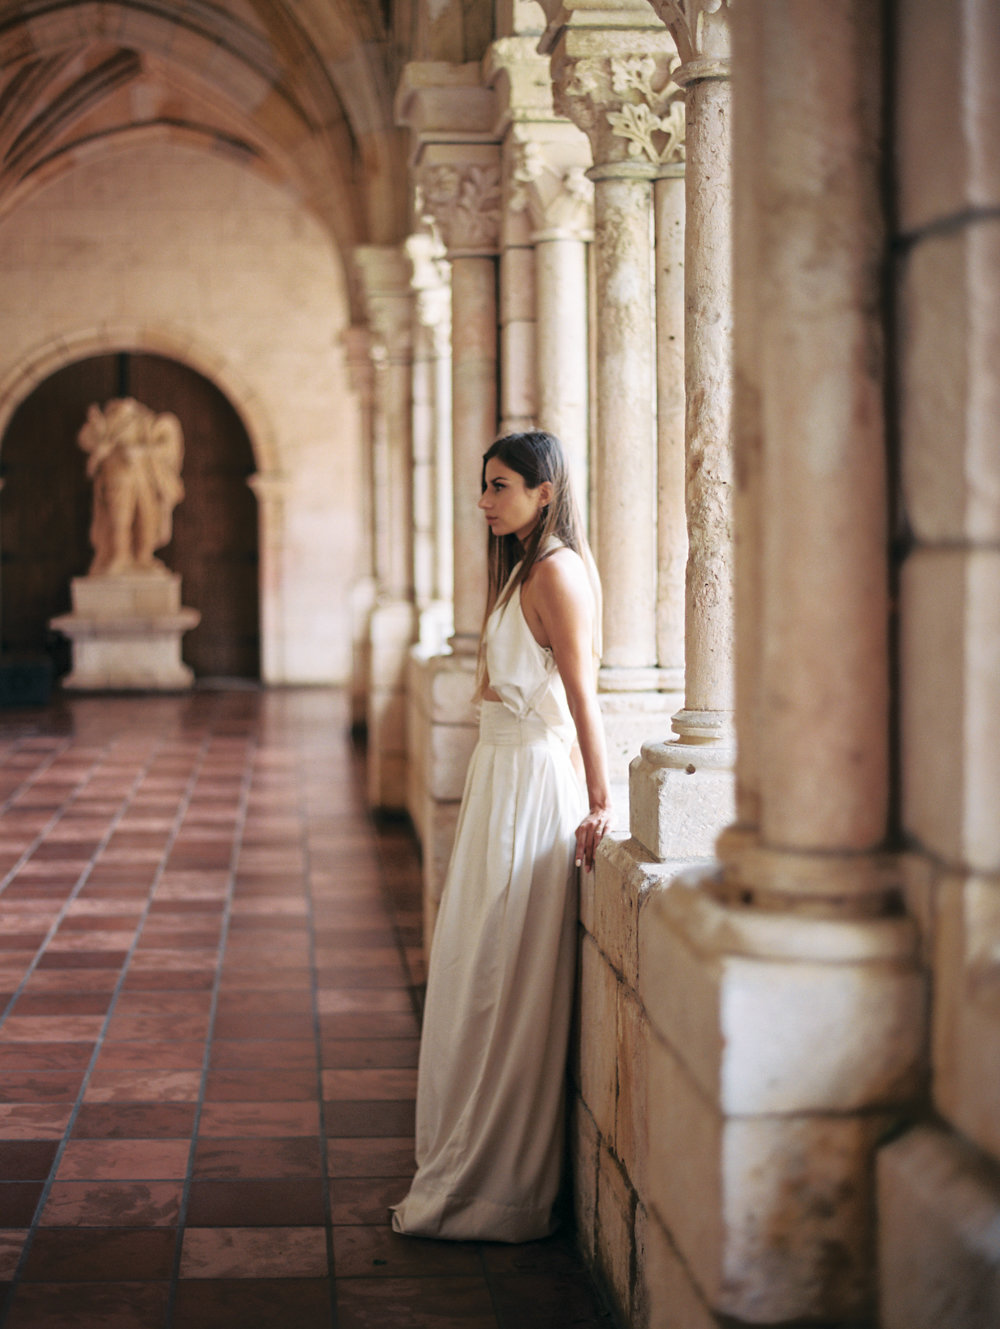 LaurenKinsey_SpainWedding_LisbonWedding_MiamiWedding054.JPG